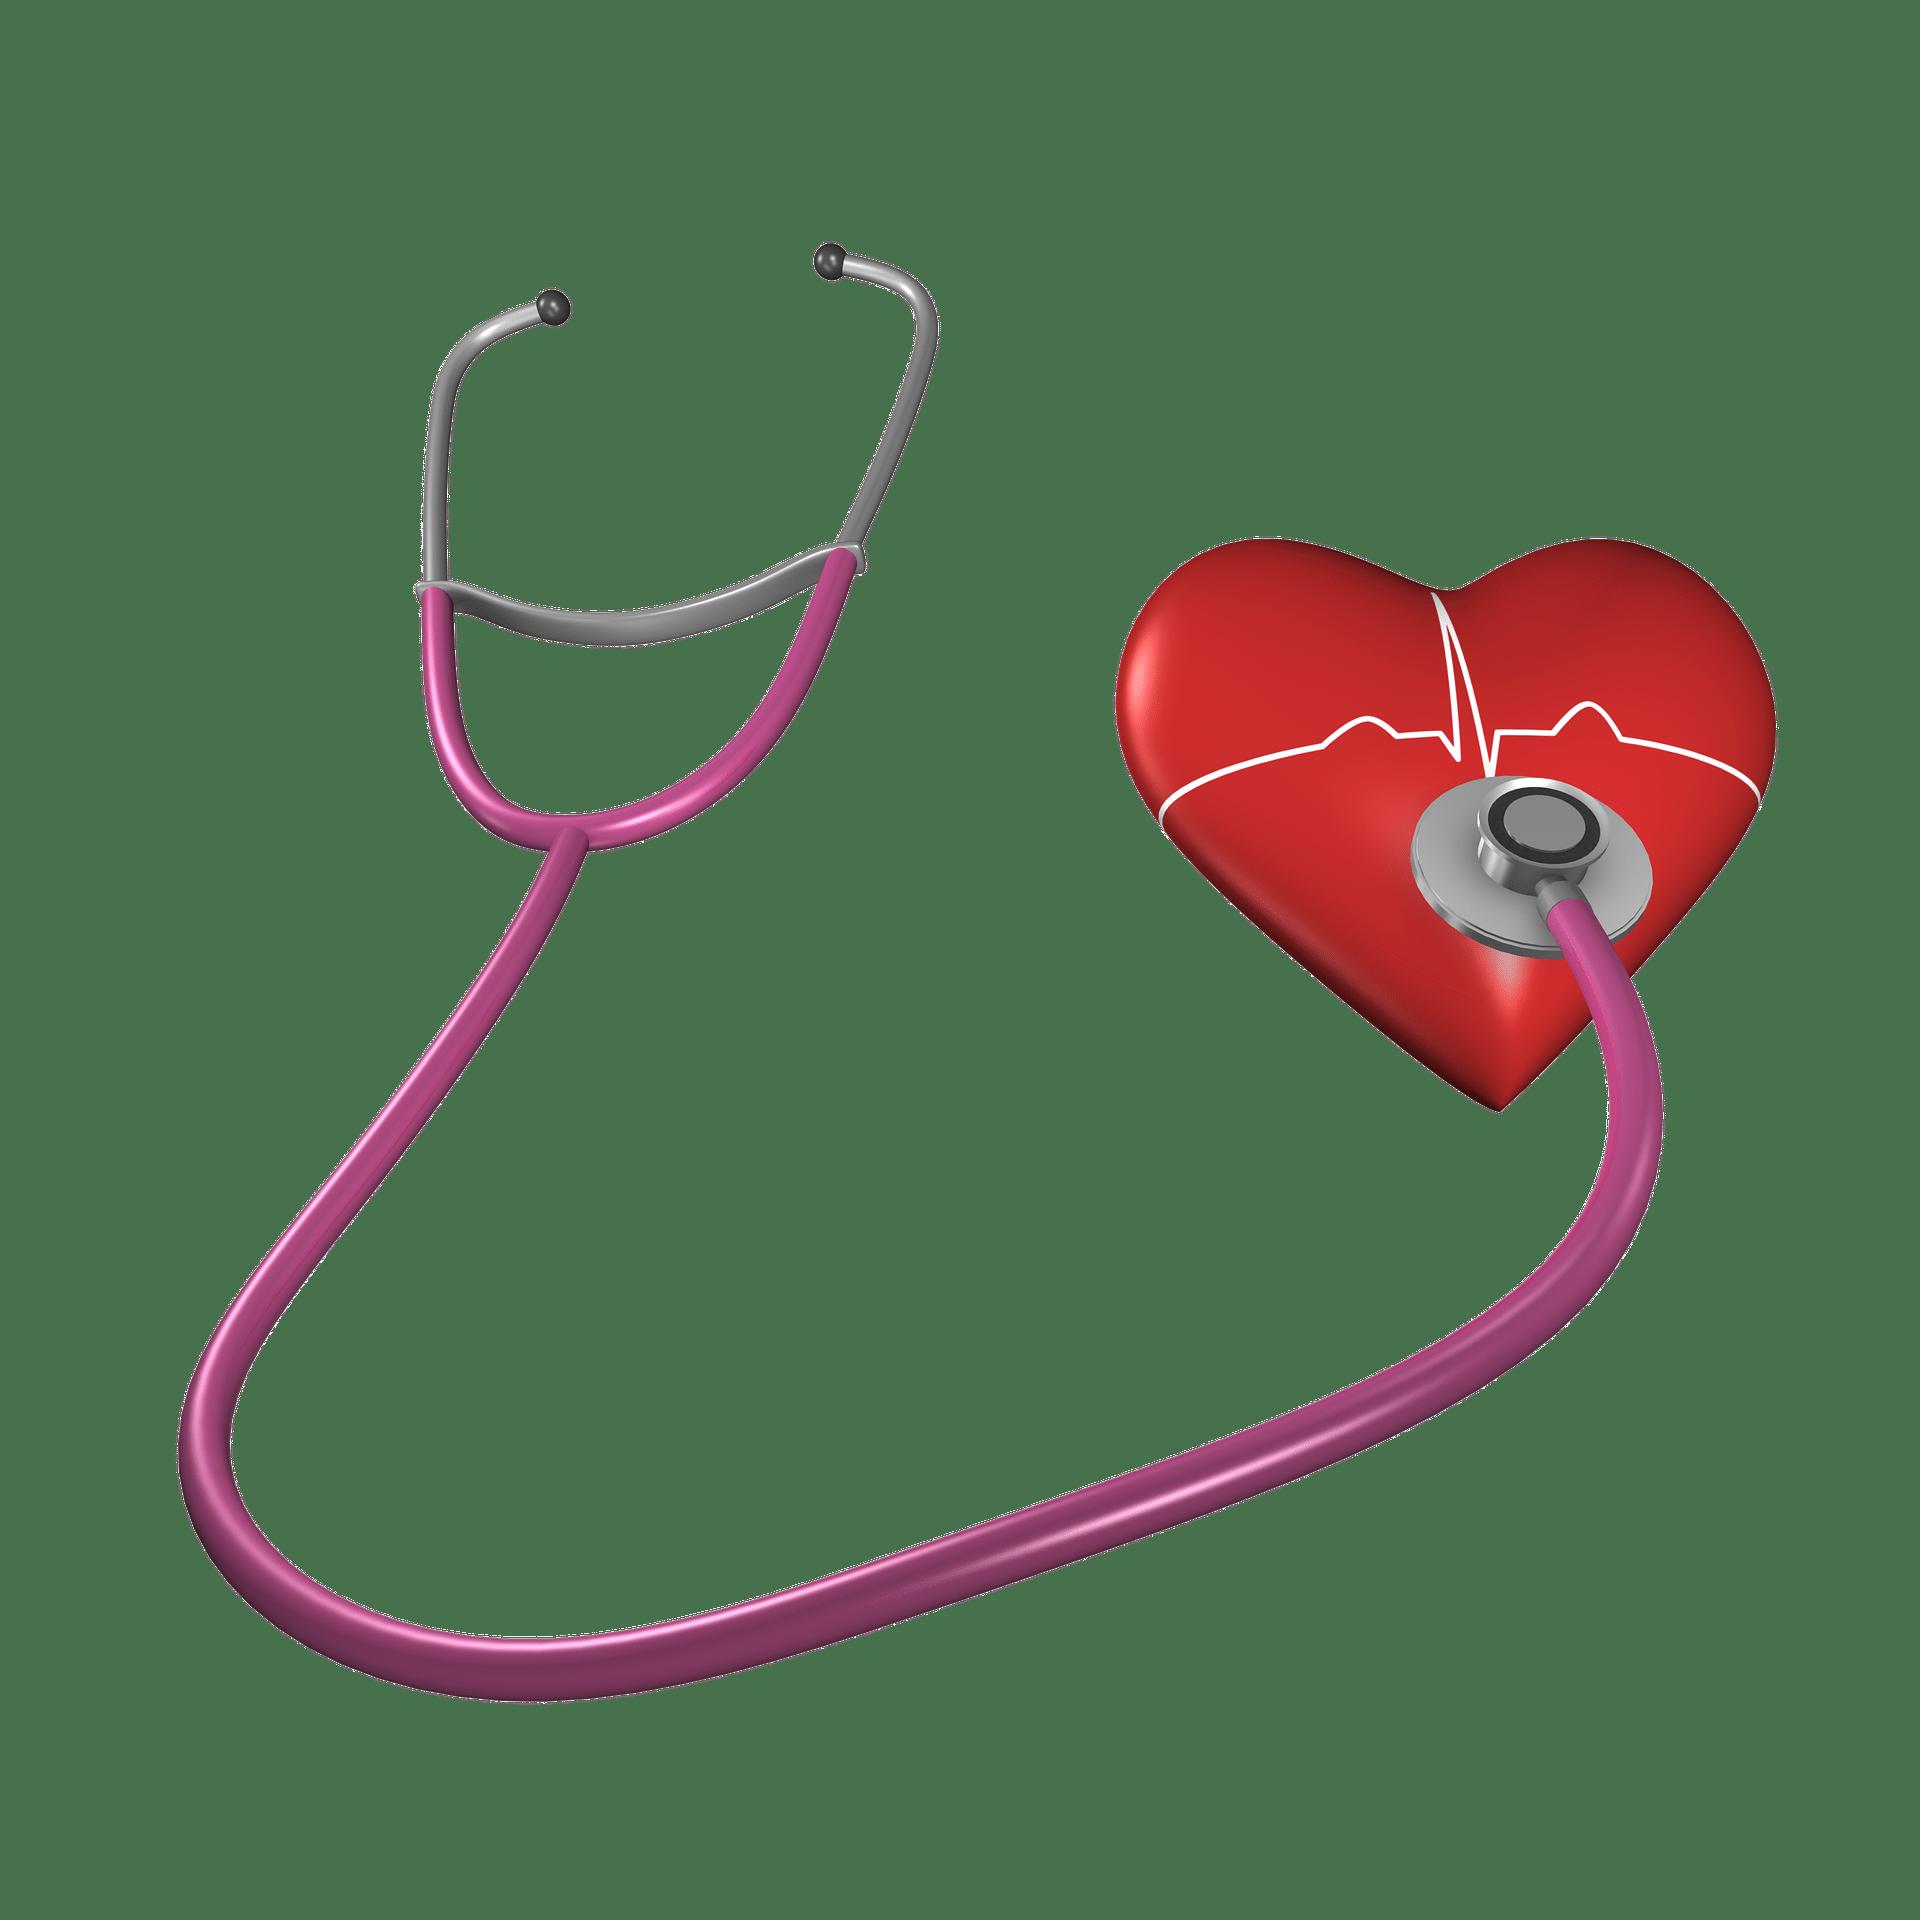 Assura assurance maladie